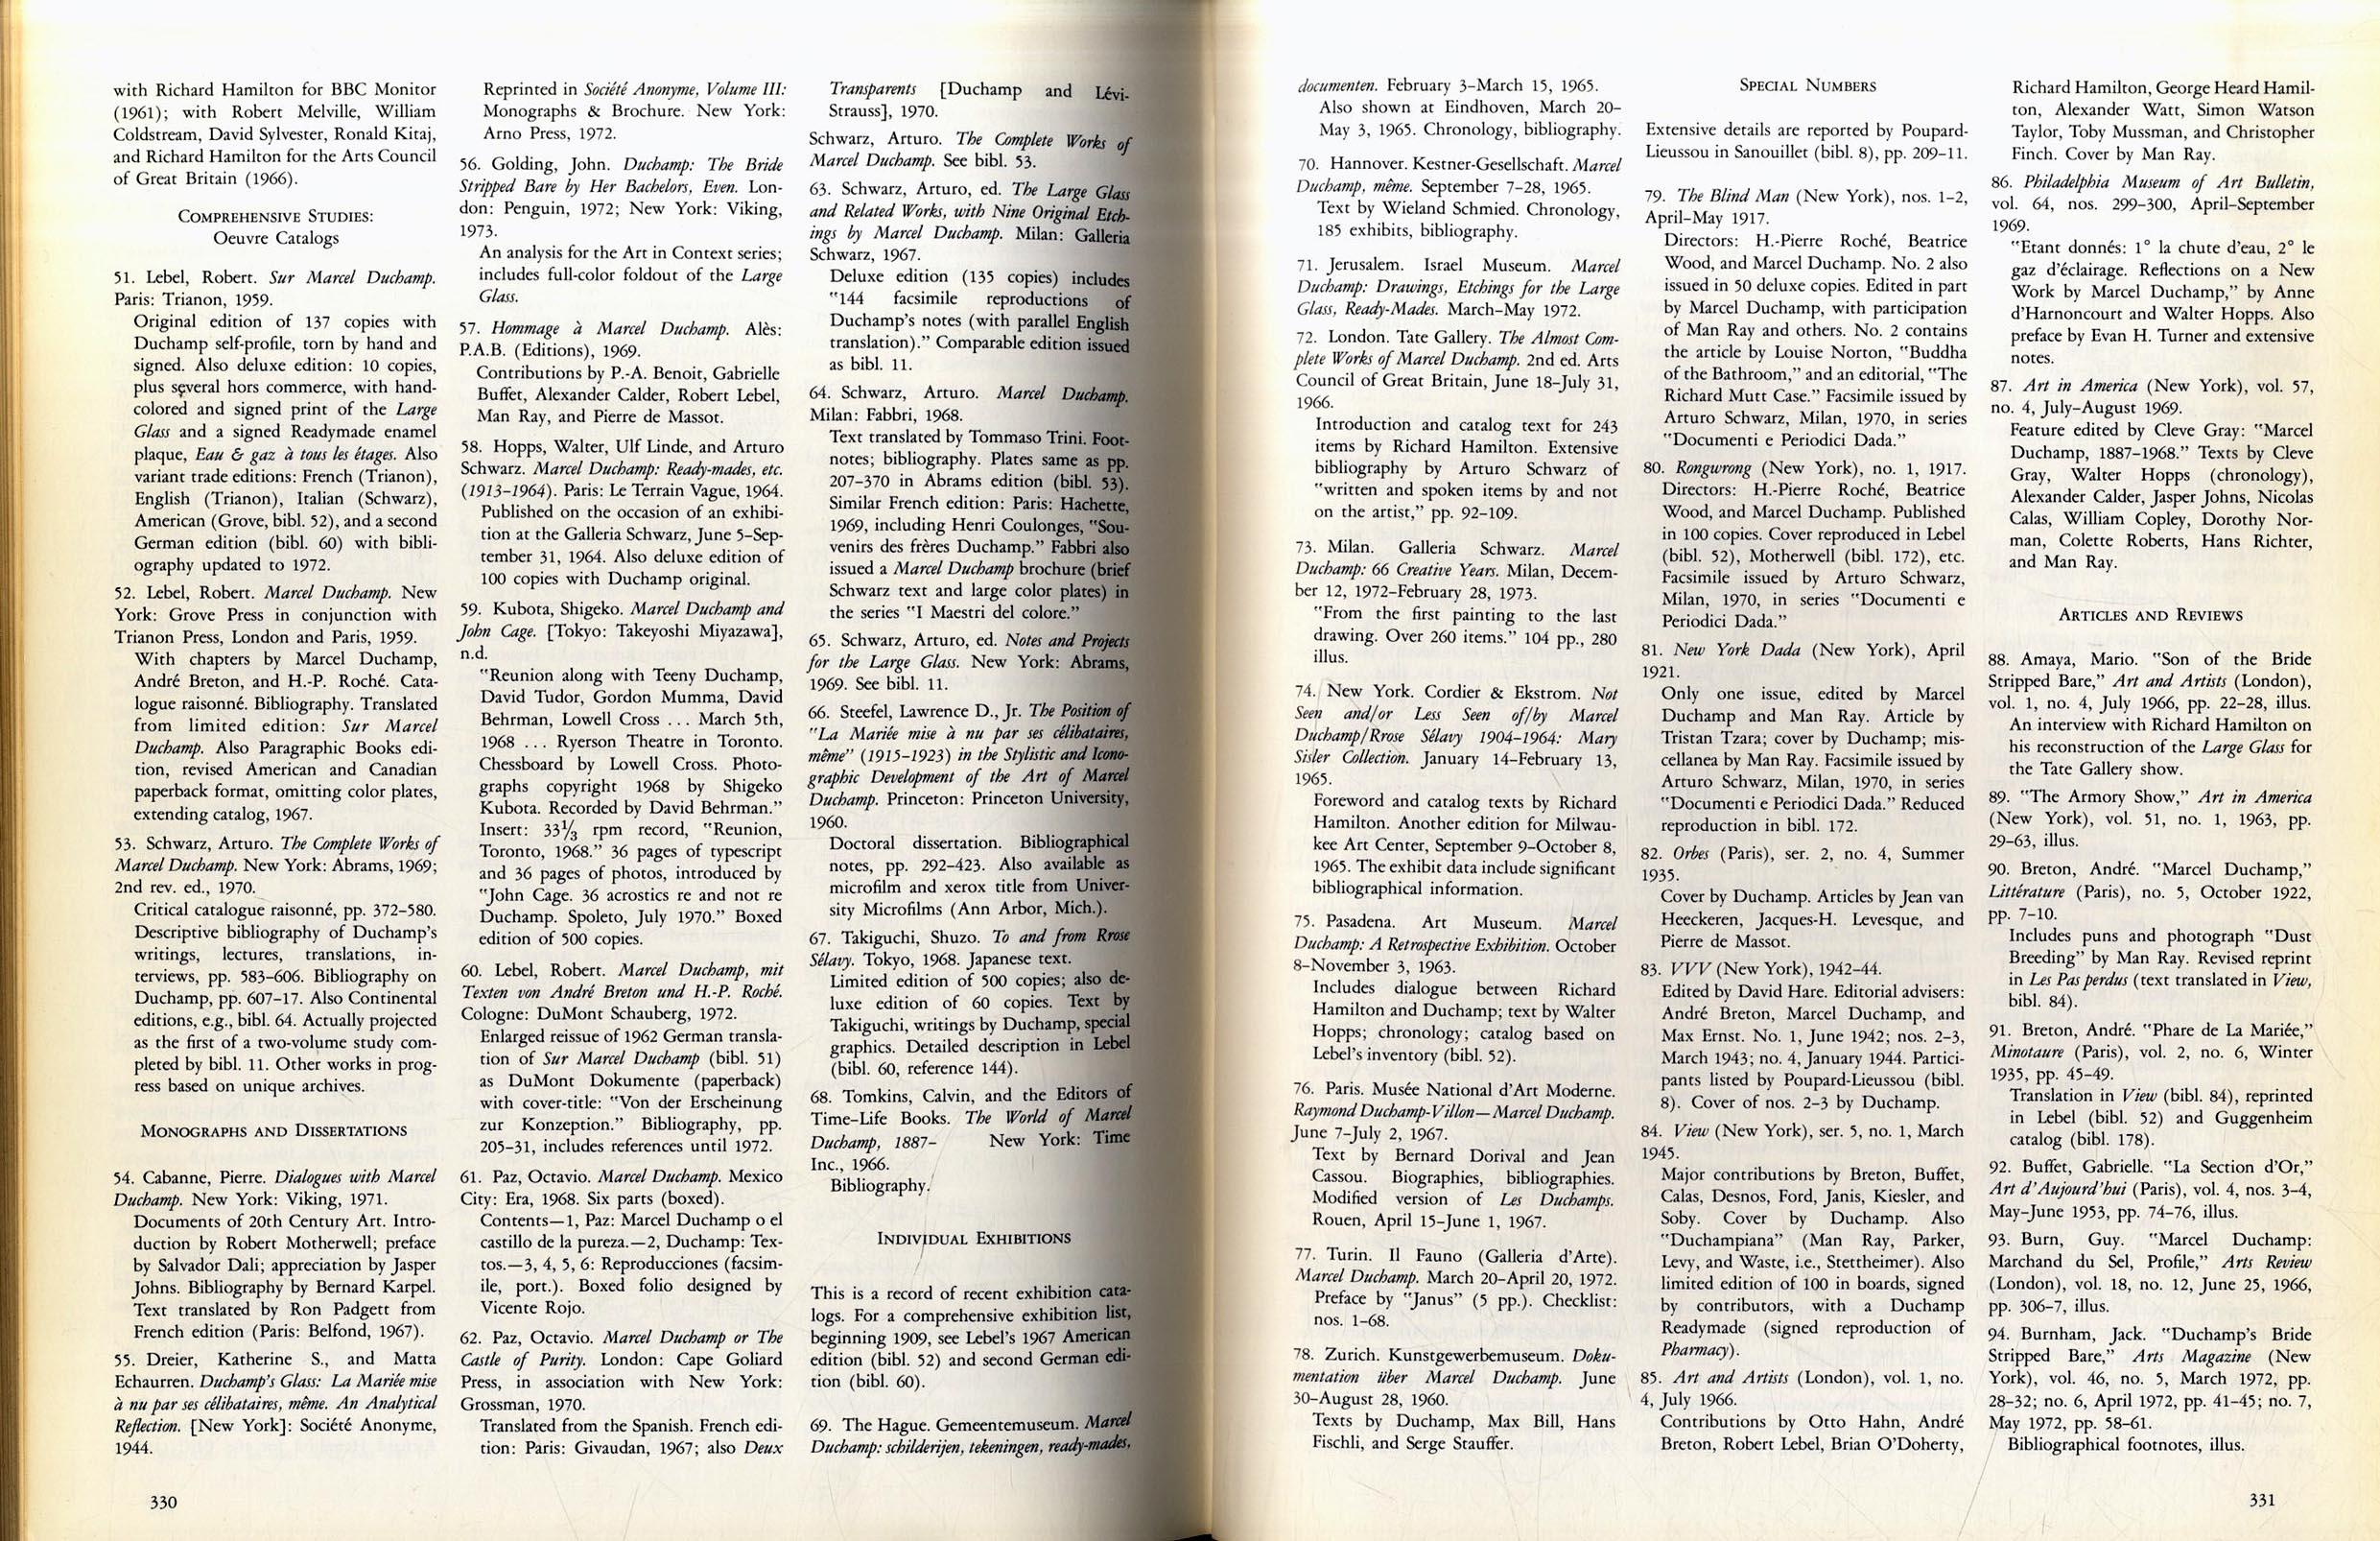 Duchamp Illustrated Bibliography